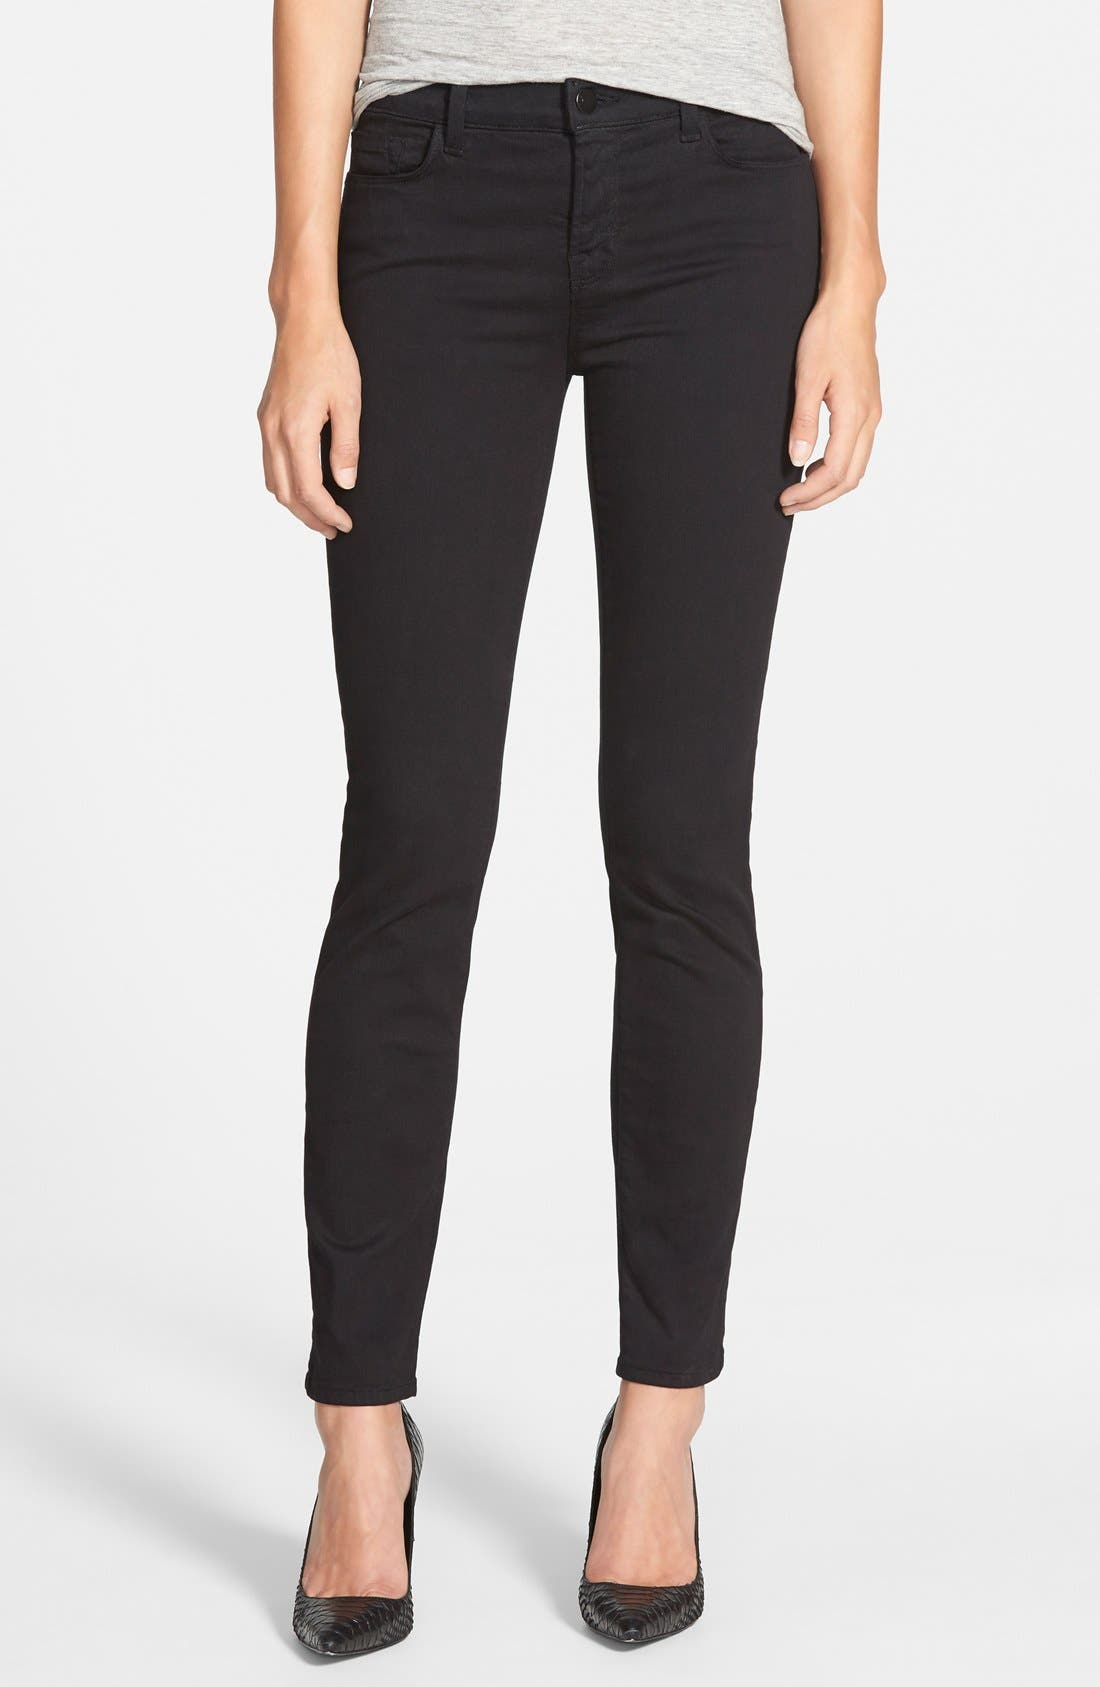 Alternate Image 1 Selected - J Brand '811' Mid Rise Skinny Jeans (Black) (Nordstrom Exclusive)